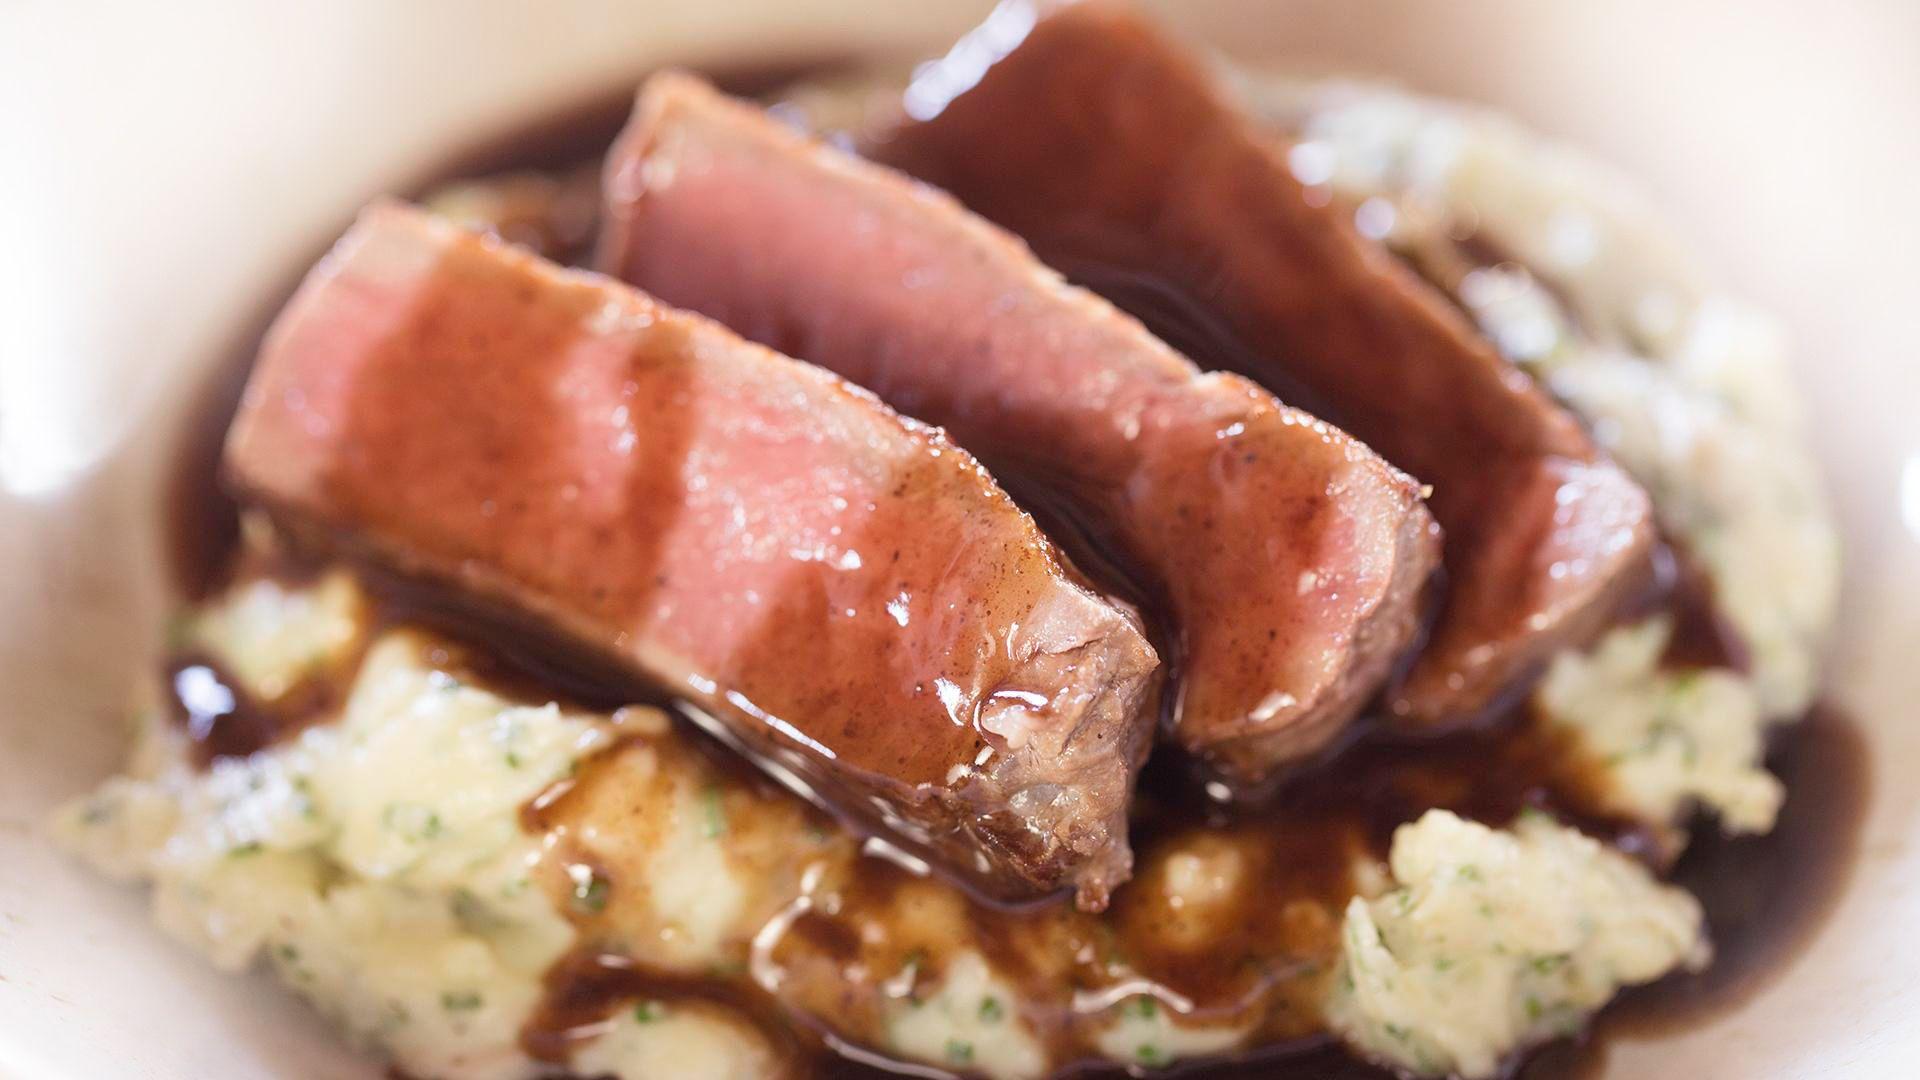 Simple Sous Vide Steak With Red Wine Sauce Sous Vide Recipe Recipe Sous Vide Recipes Smashed Potatoes Recipe Sous Vide Steak